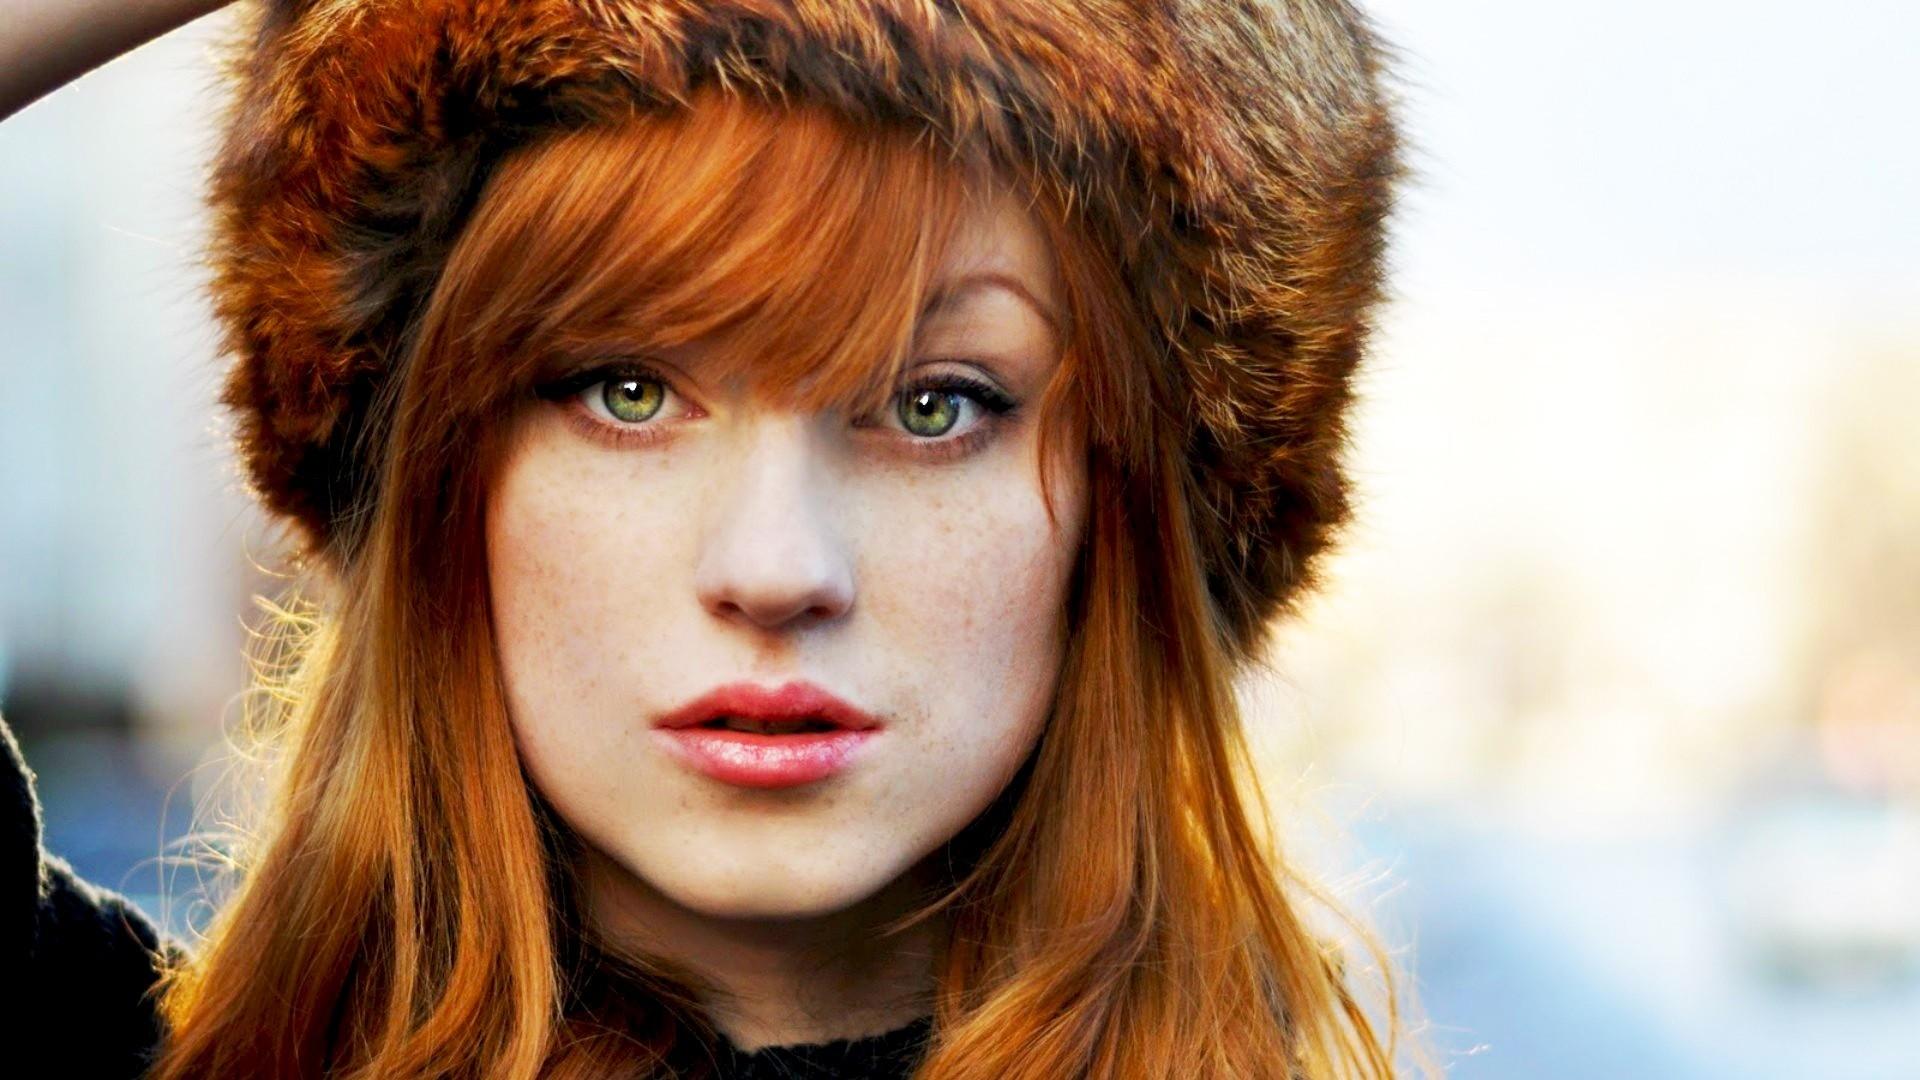 Beautiful Redhead Girl With Fur Hat – Wallpaper #40367 Hot Irish Women